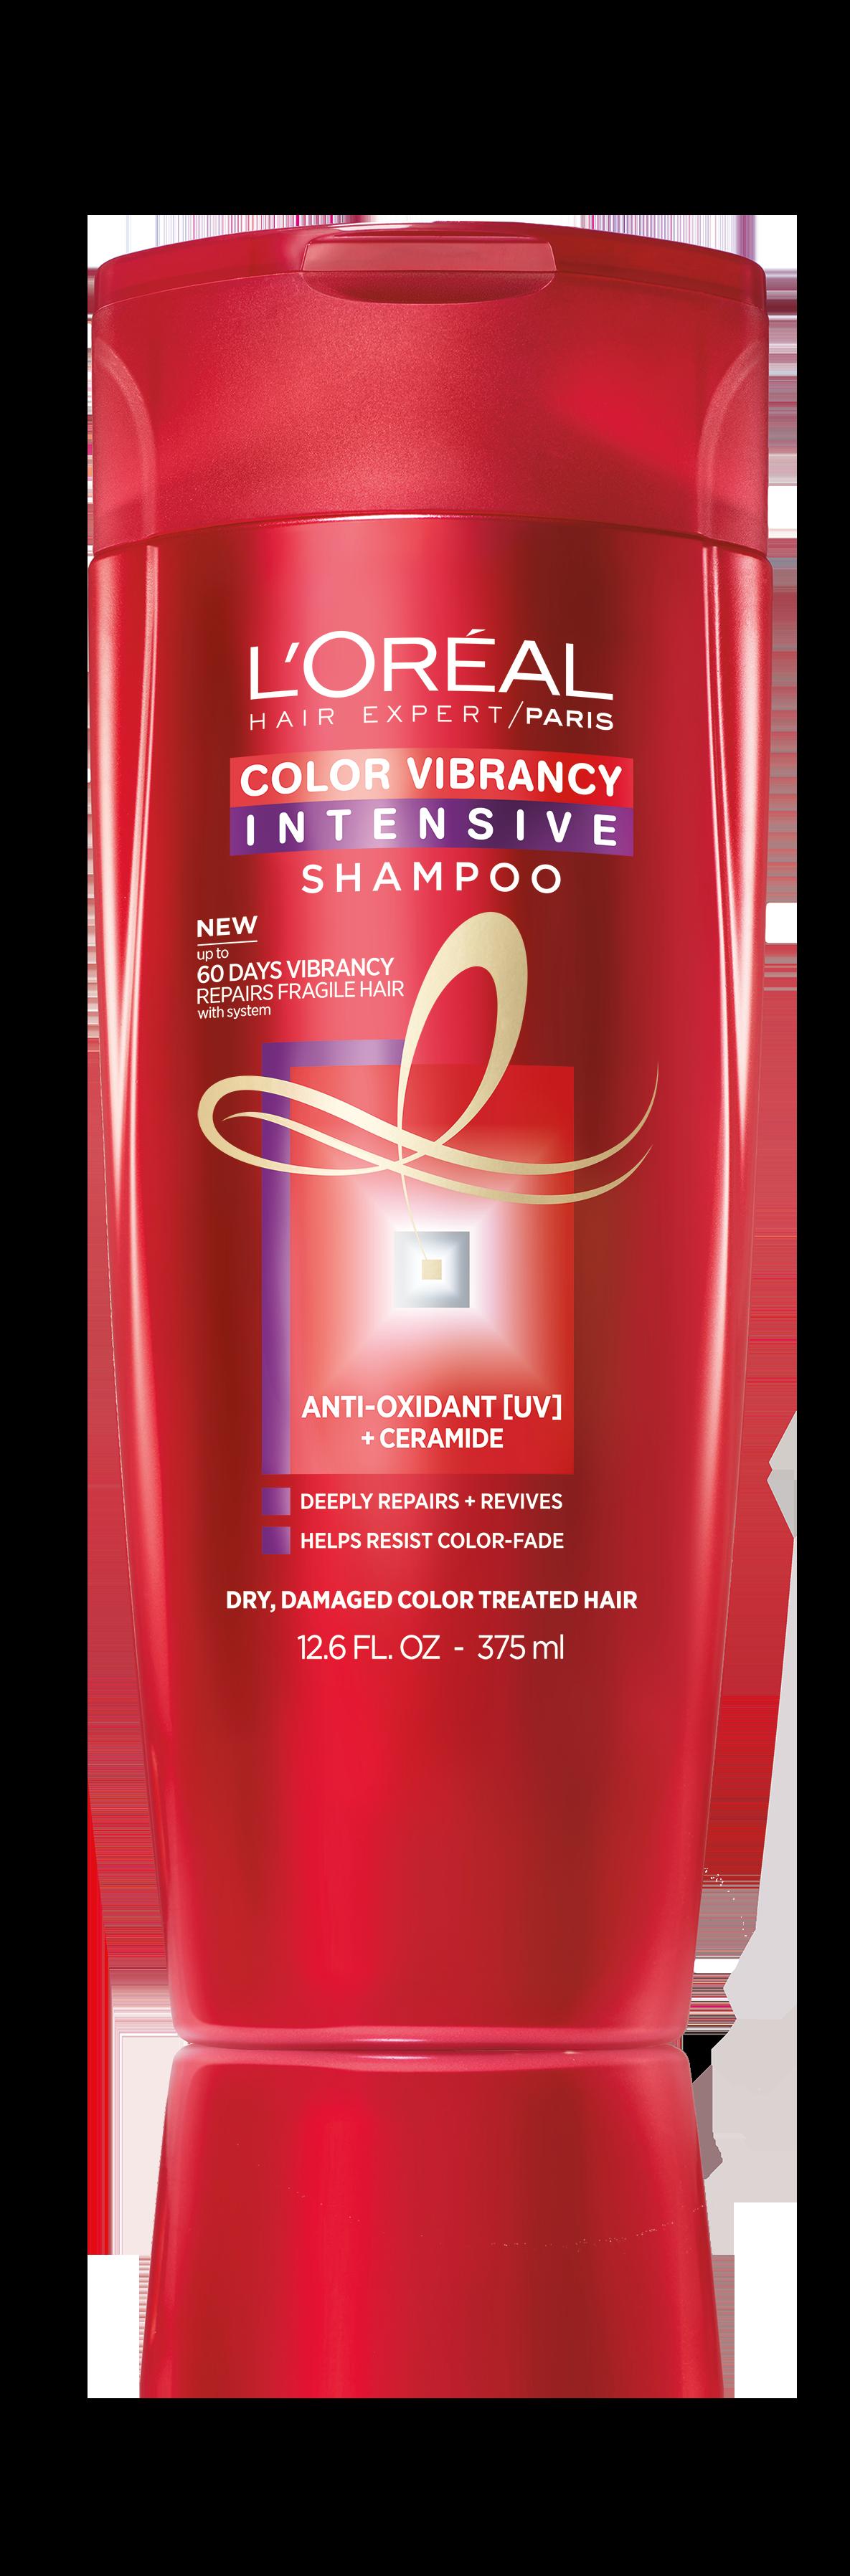 L'Oréal Color Vibrancy Intensive Shampoo